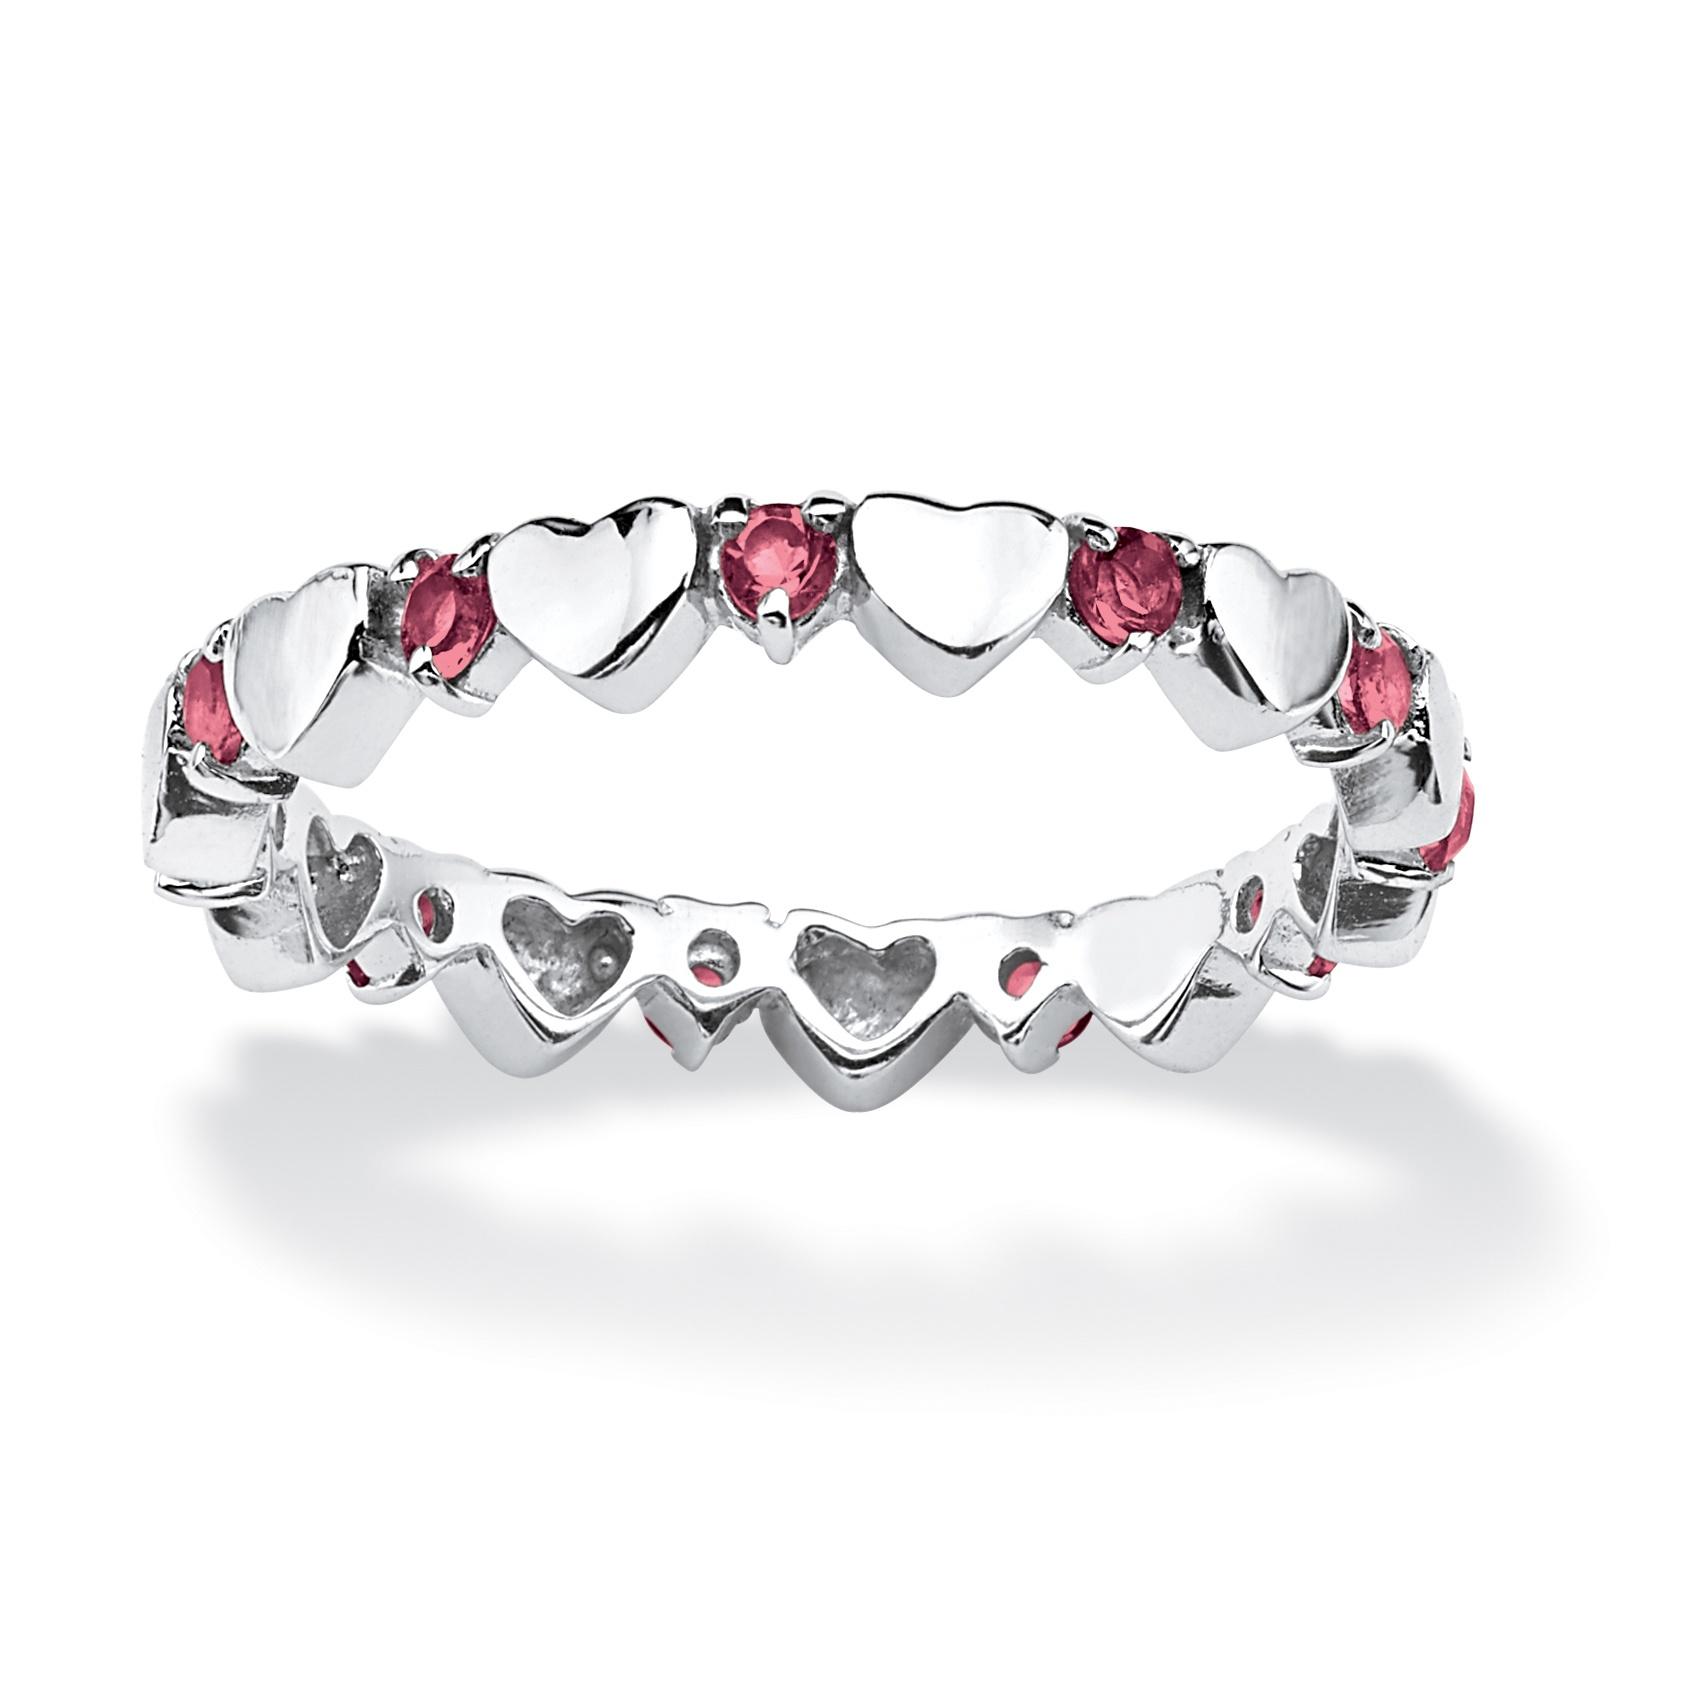 Birthstone 925 Silver Eternity Heart Ring October ...